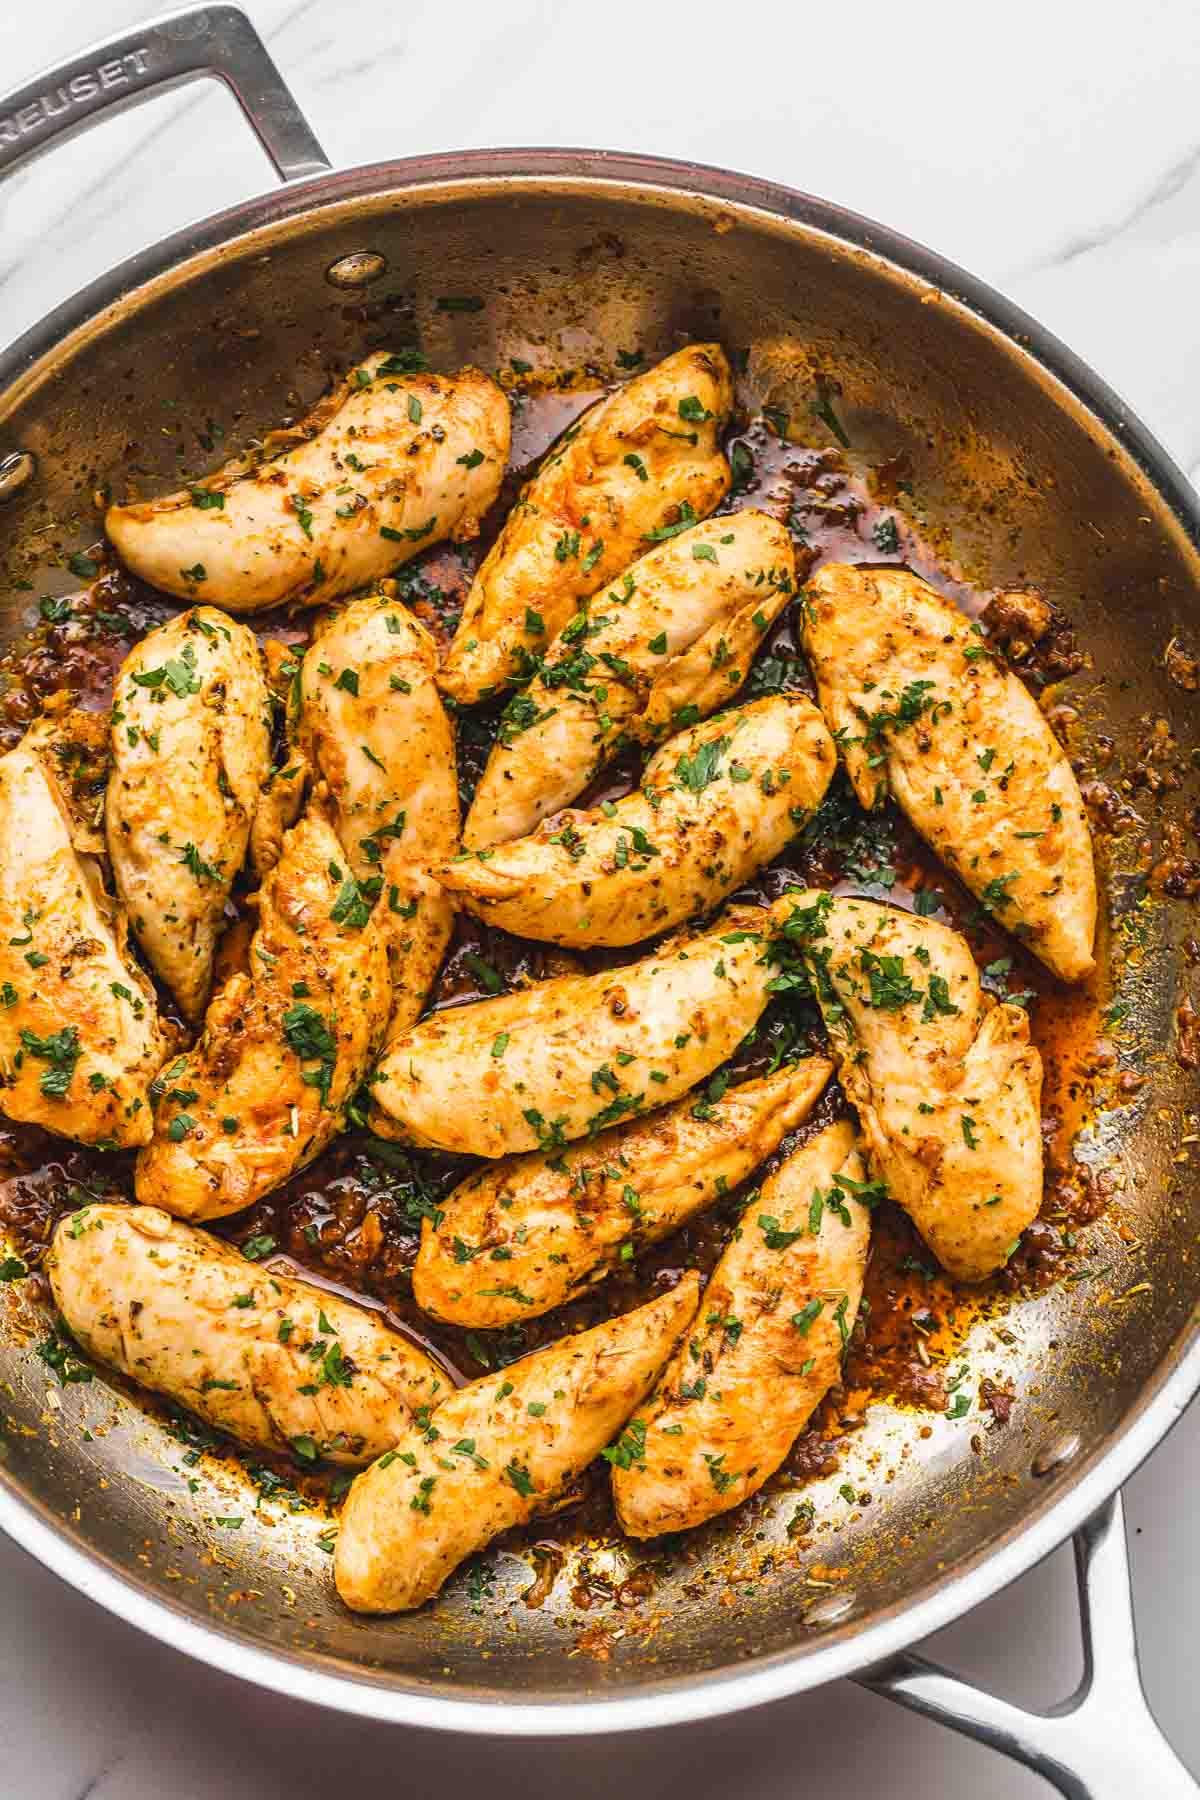 Chicken tenders in a le creuset skillet